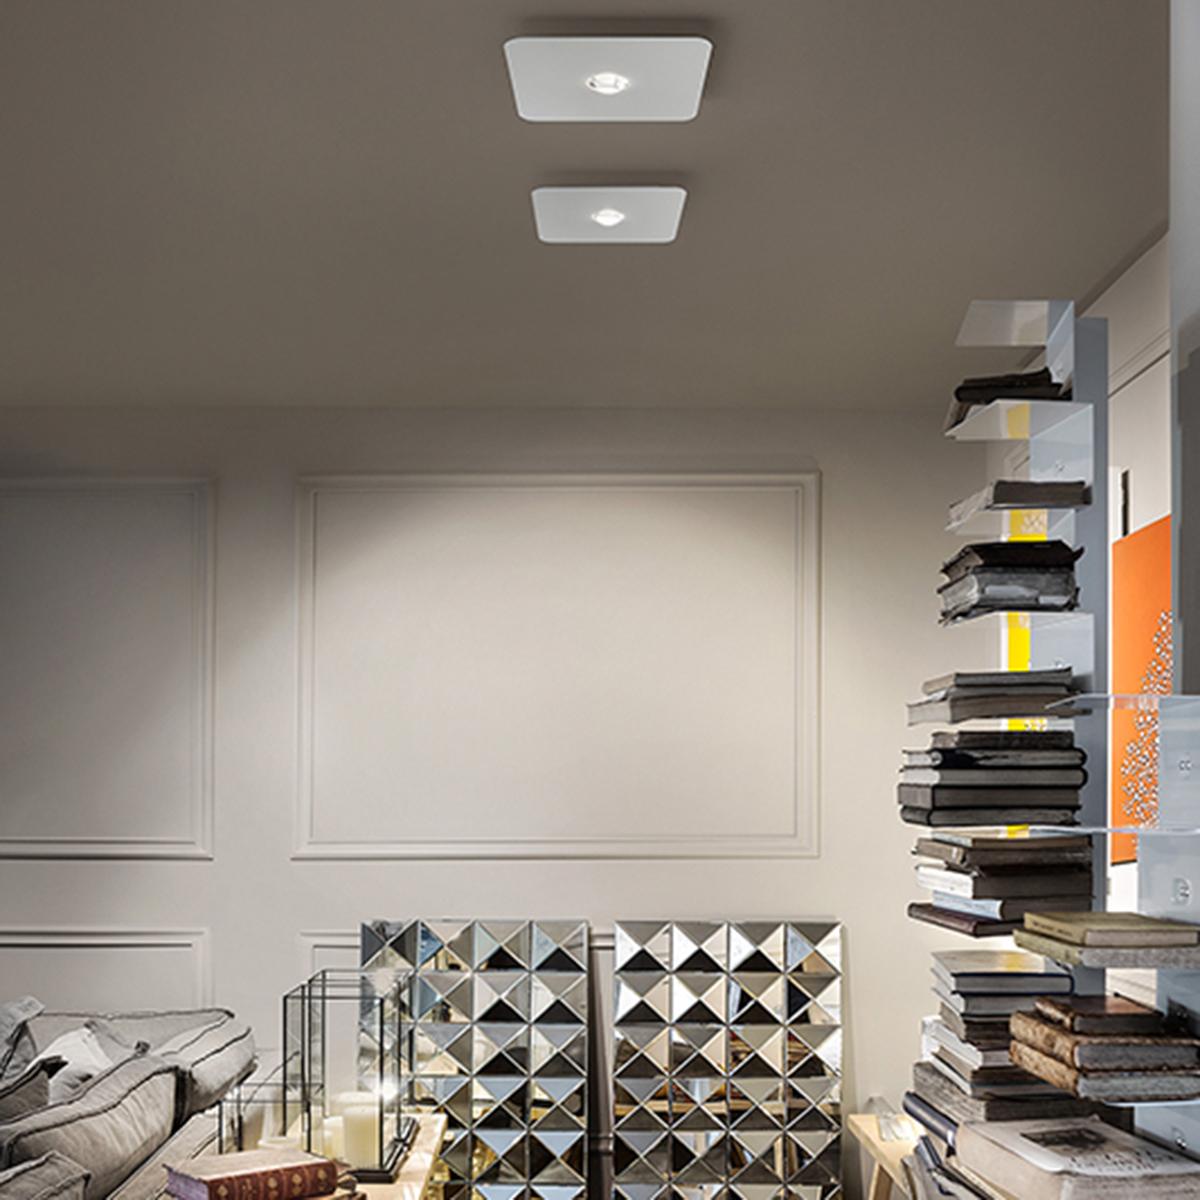 studio italia design frozen. Black Bedroom Furniture Sets. Home Design Ideas